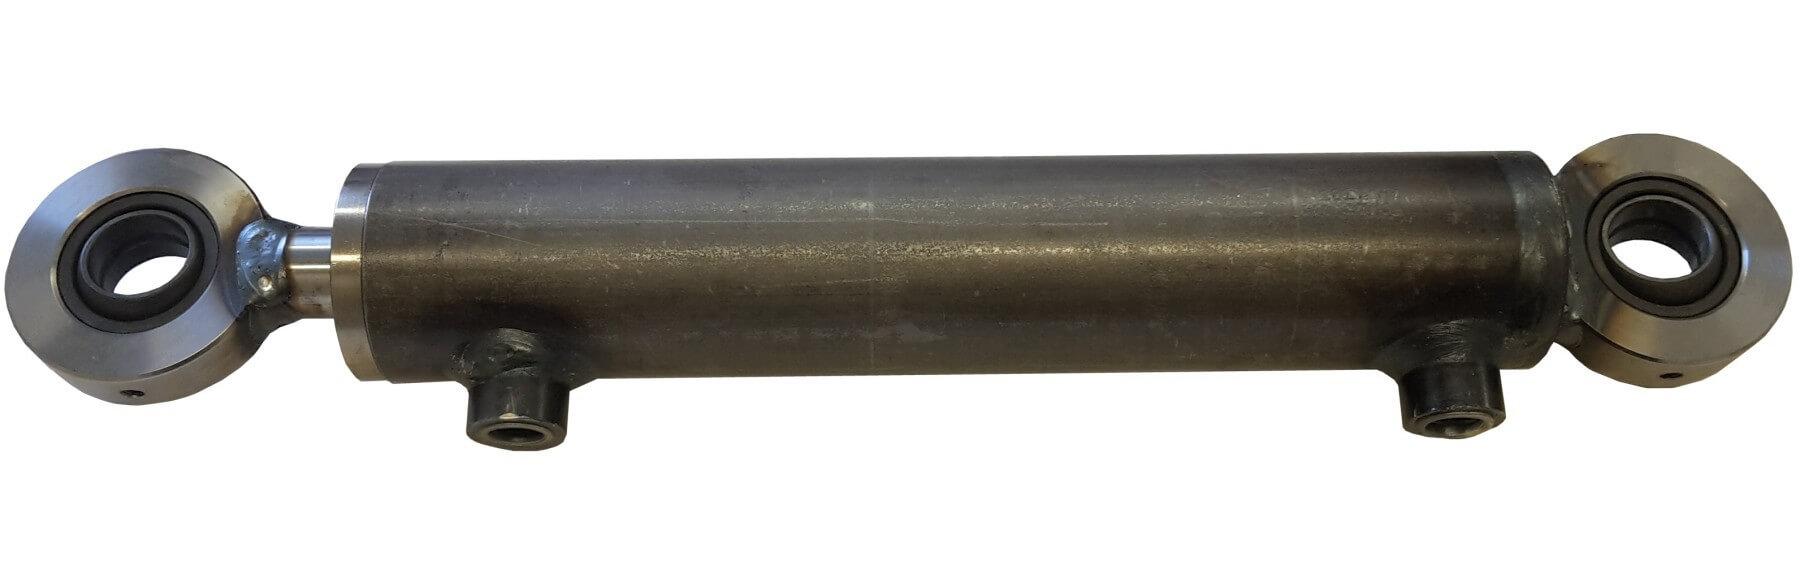 Hydraulisylinteri CL 32. 20. 50 GE